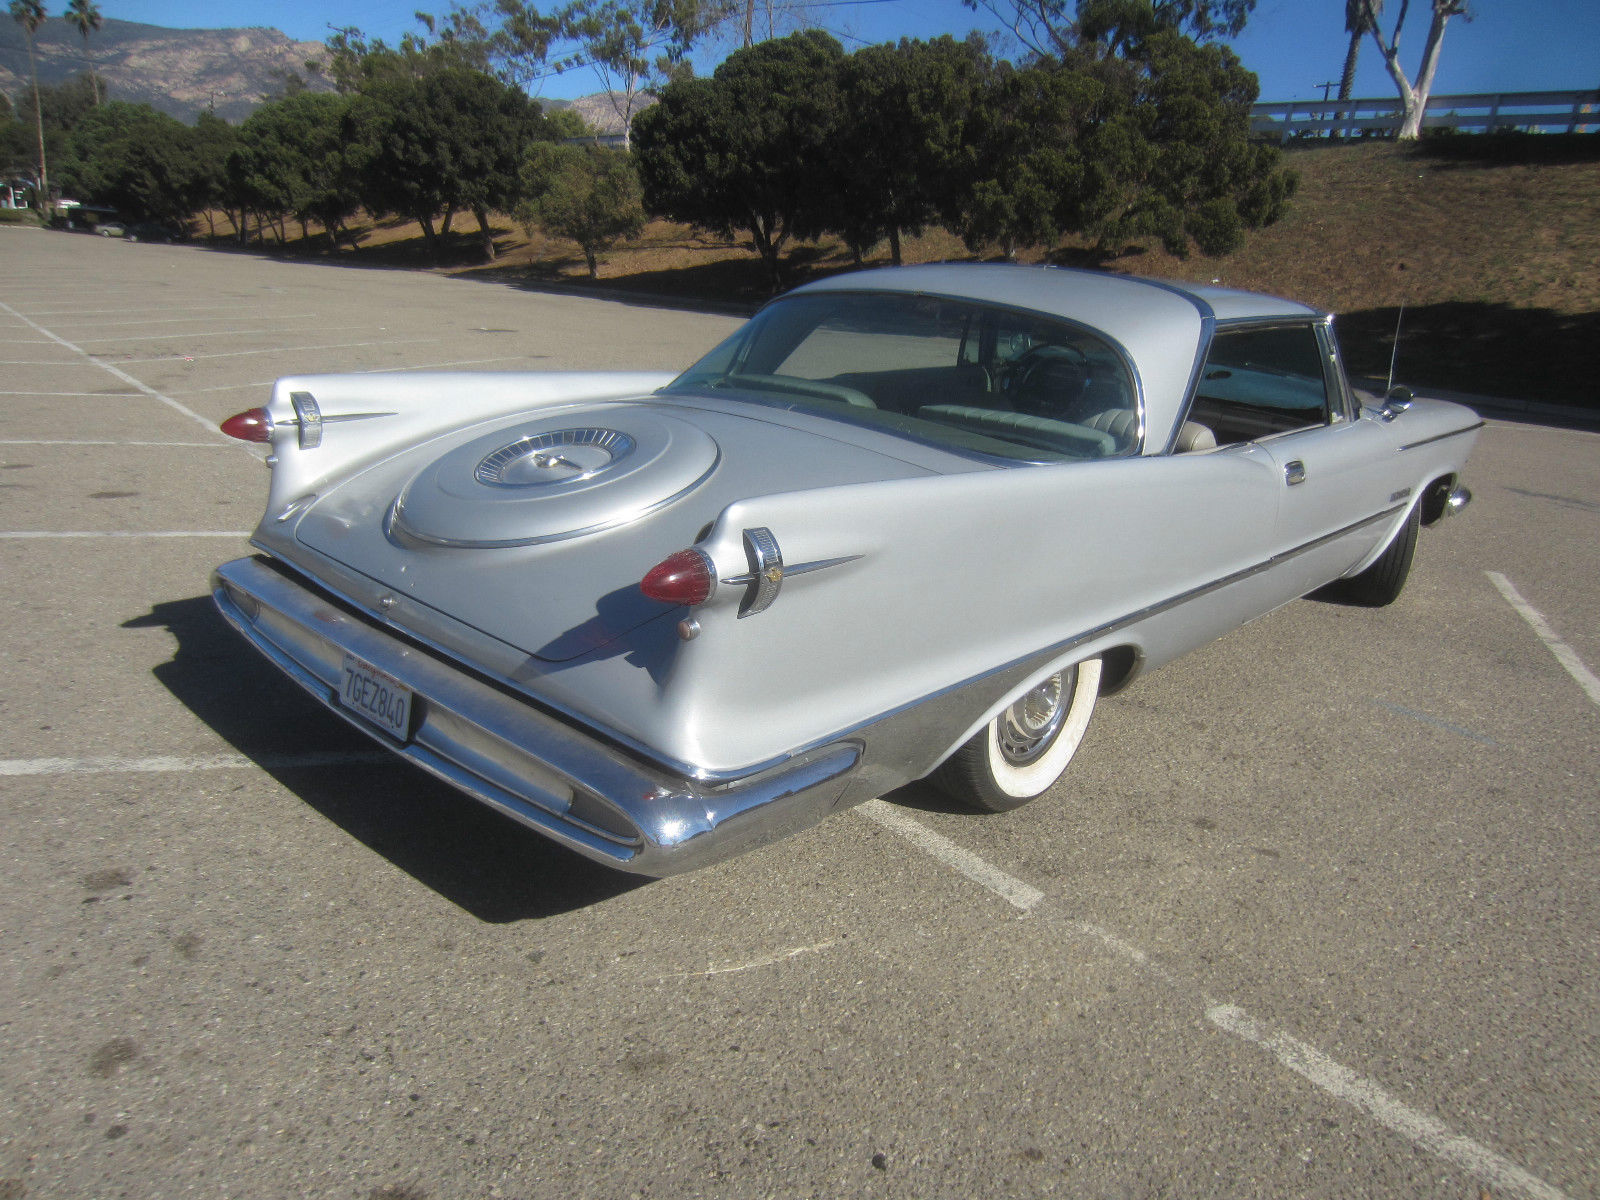 1959 Chrysler Crown Imperial 2-Door Hardtop Southampton Coupe 1957 1958 1960 - Classic Chrysler ...